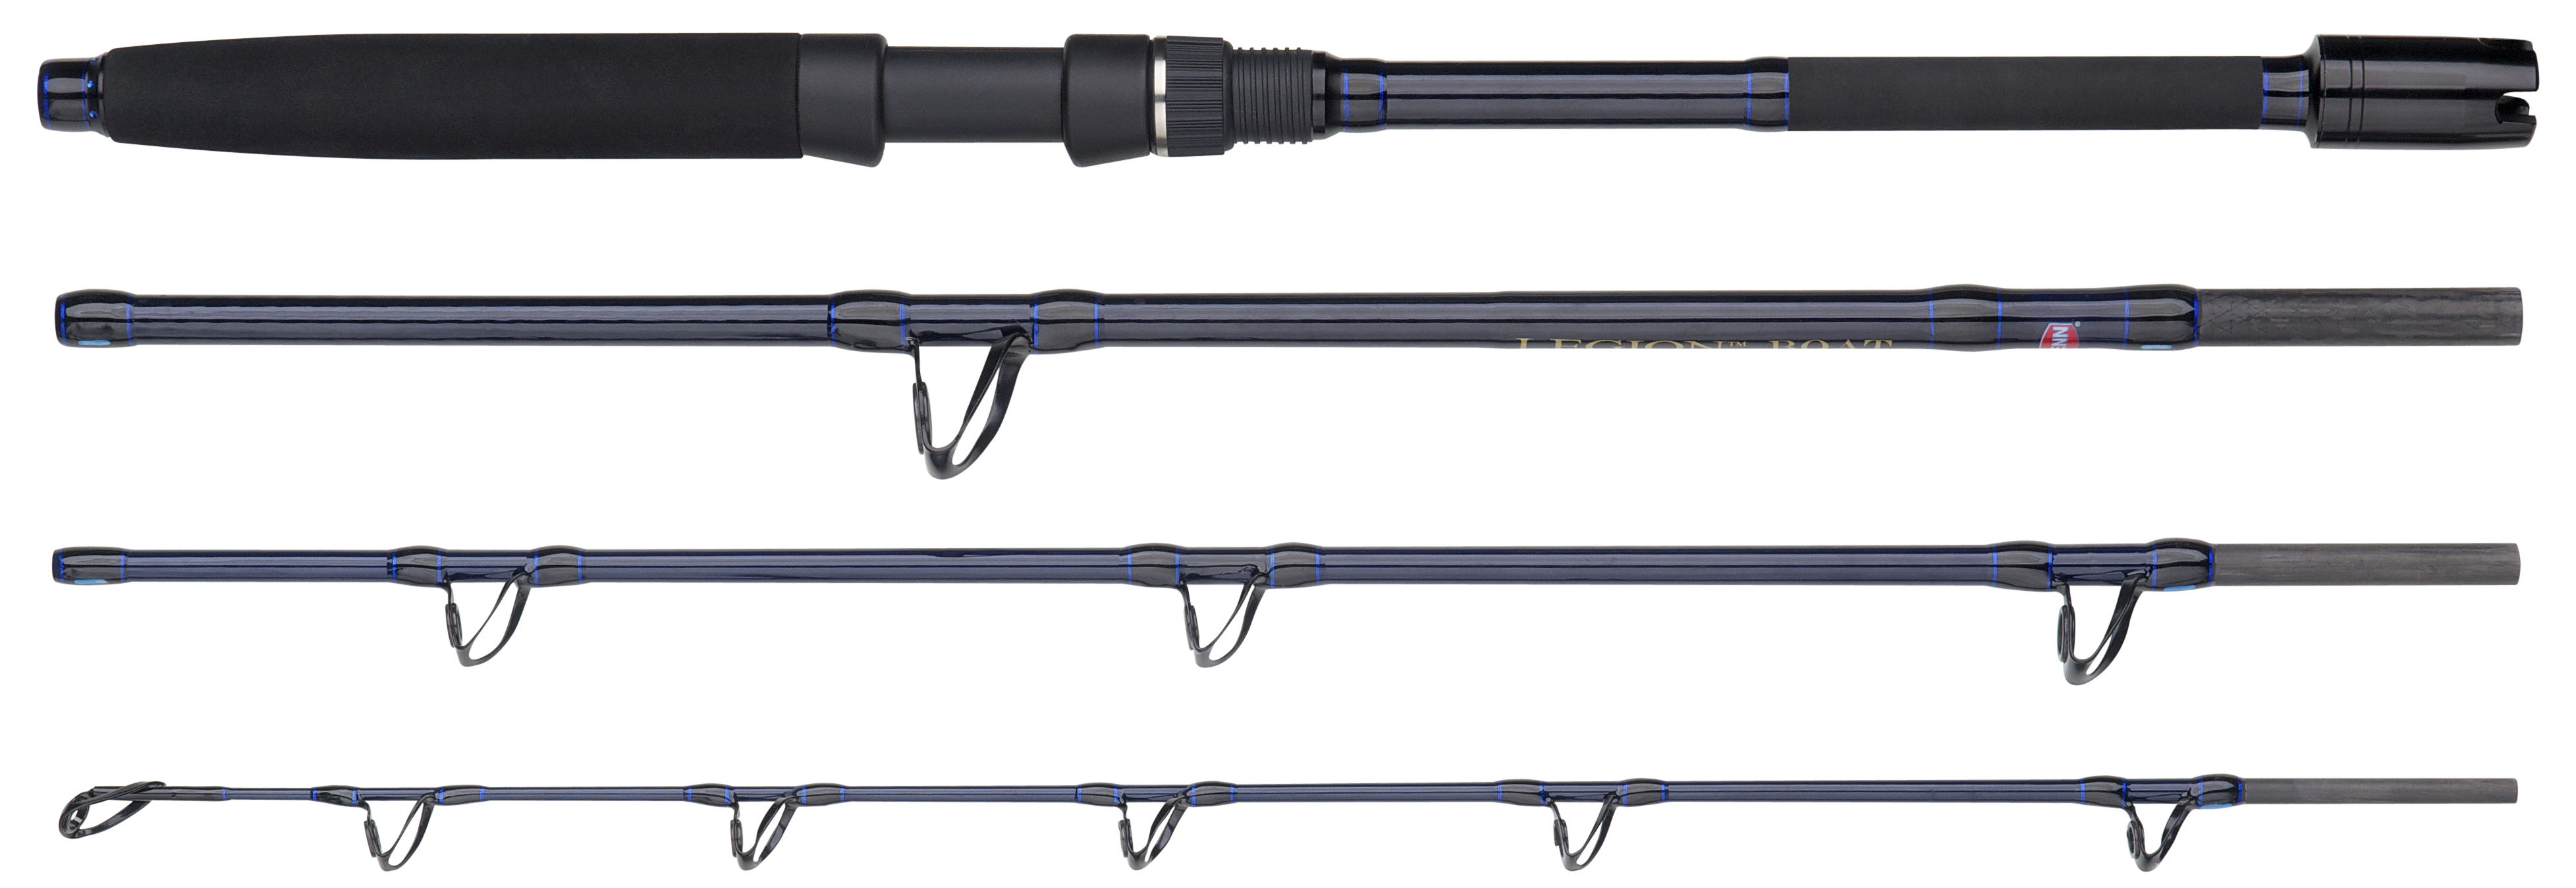 Penn legion boat rod series glasgow angling centre for Penn fishing rod